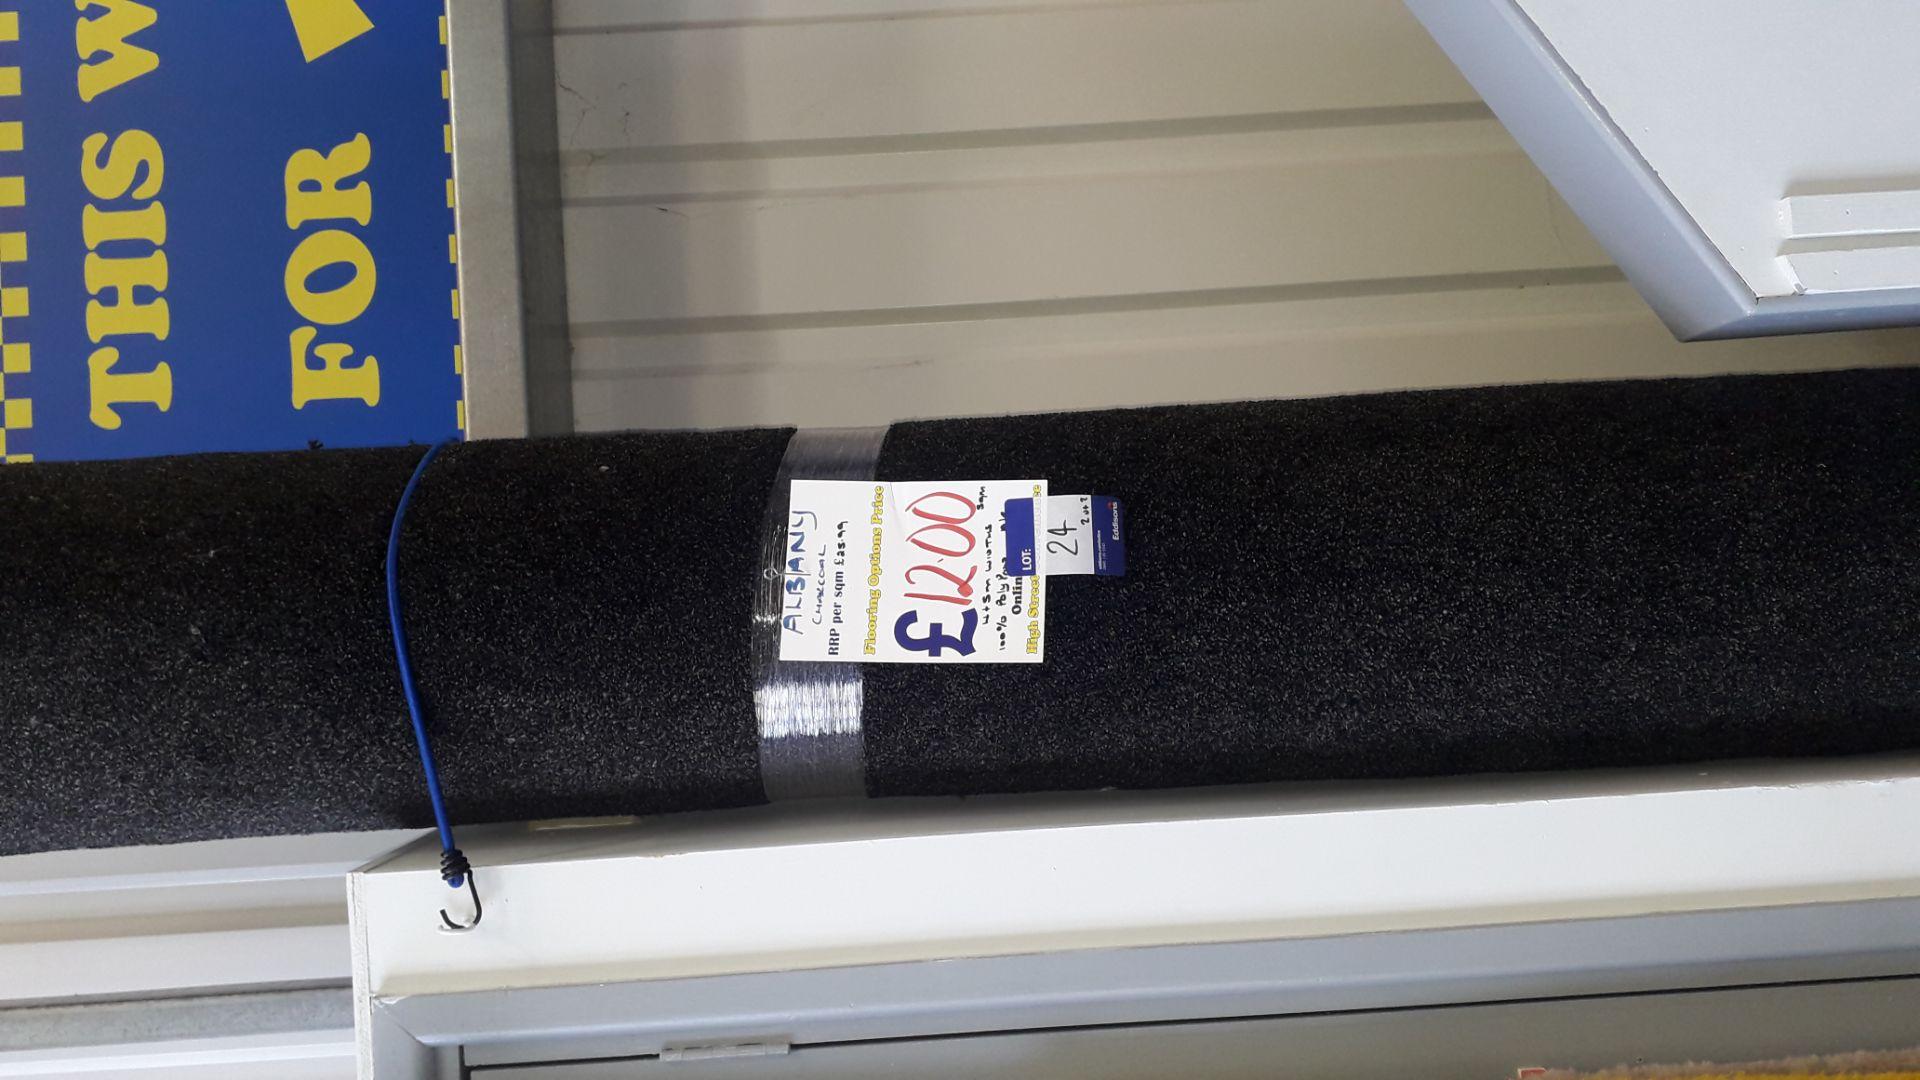 Lot 24 - 2 Rolls of 2.9m x 5m Albeny Carpet ( x Chocolate and 1 x Charcoal) Rp. £12 Sqm